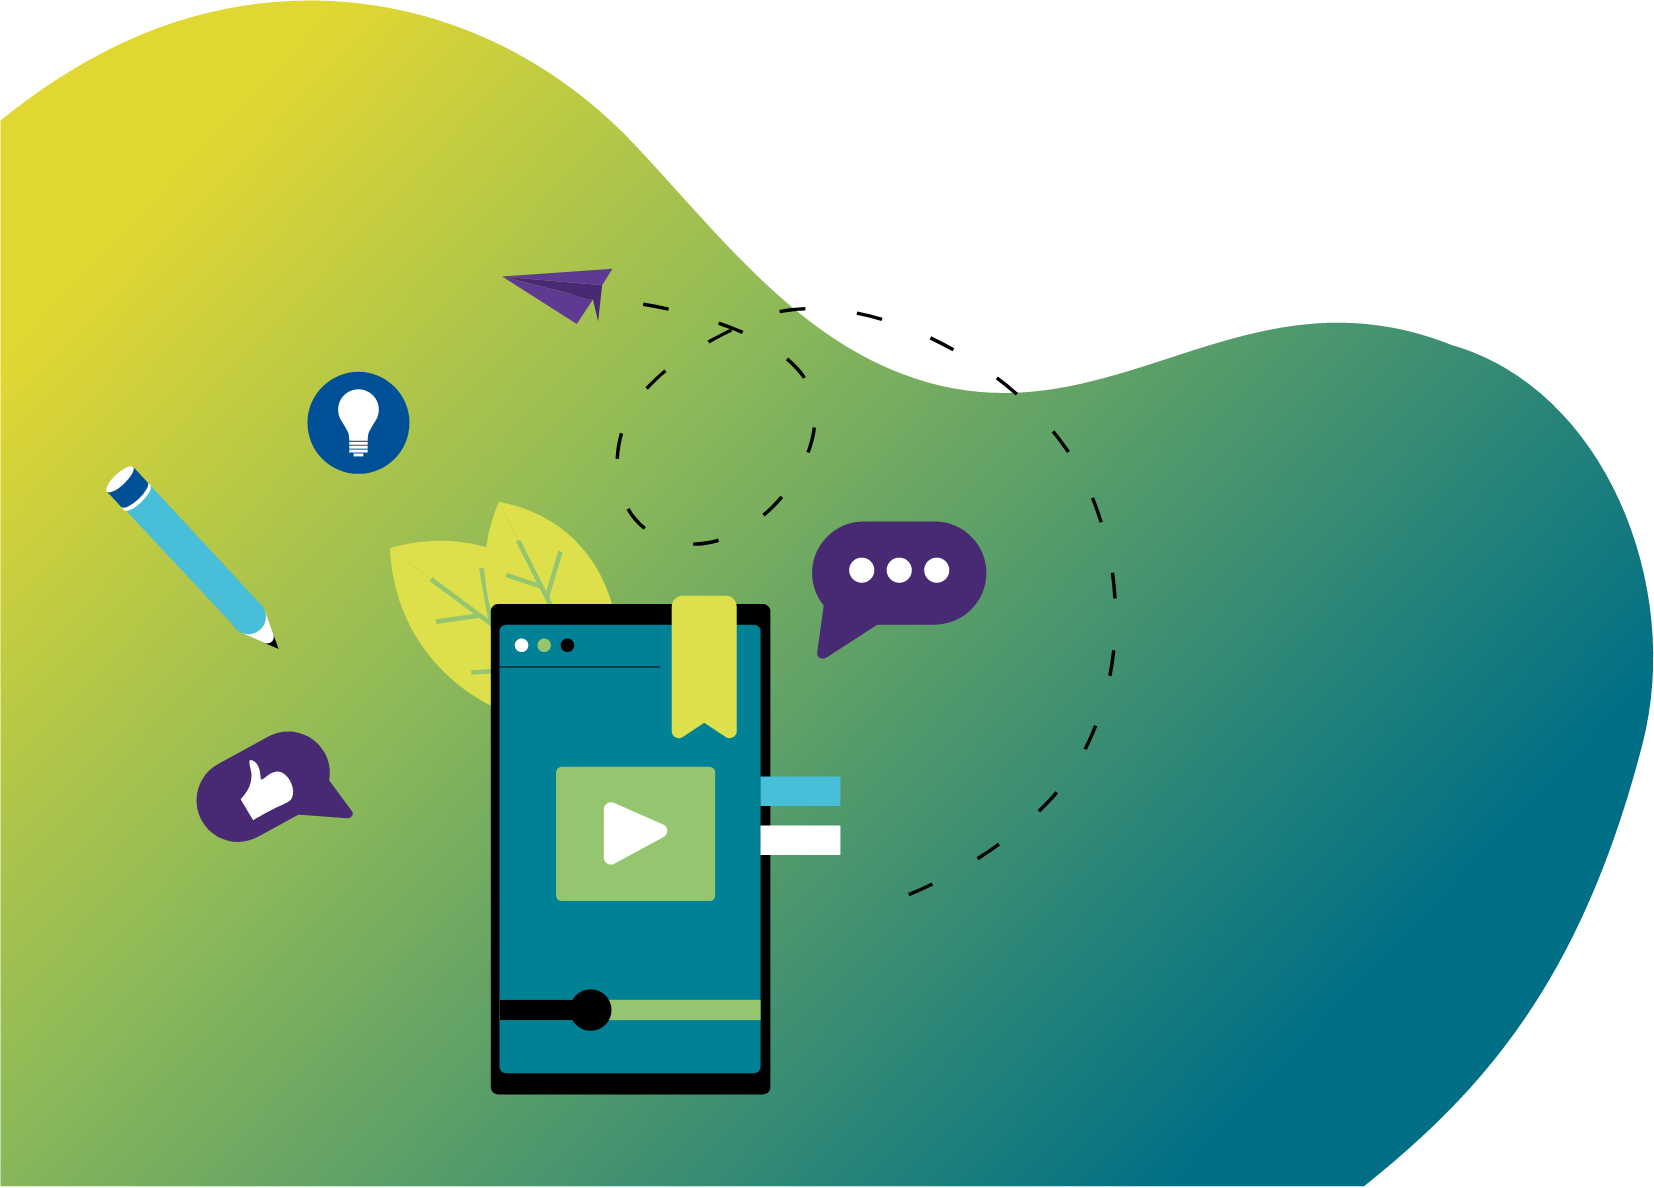 LearnChamp_deutschsprachige Community für E-Learning Teams